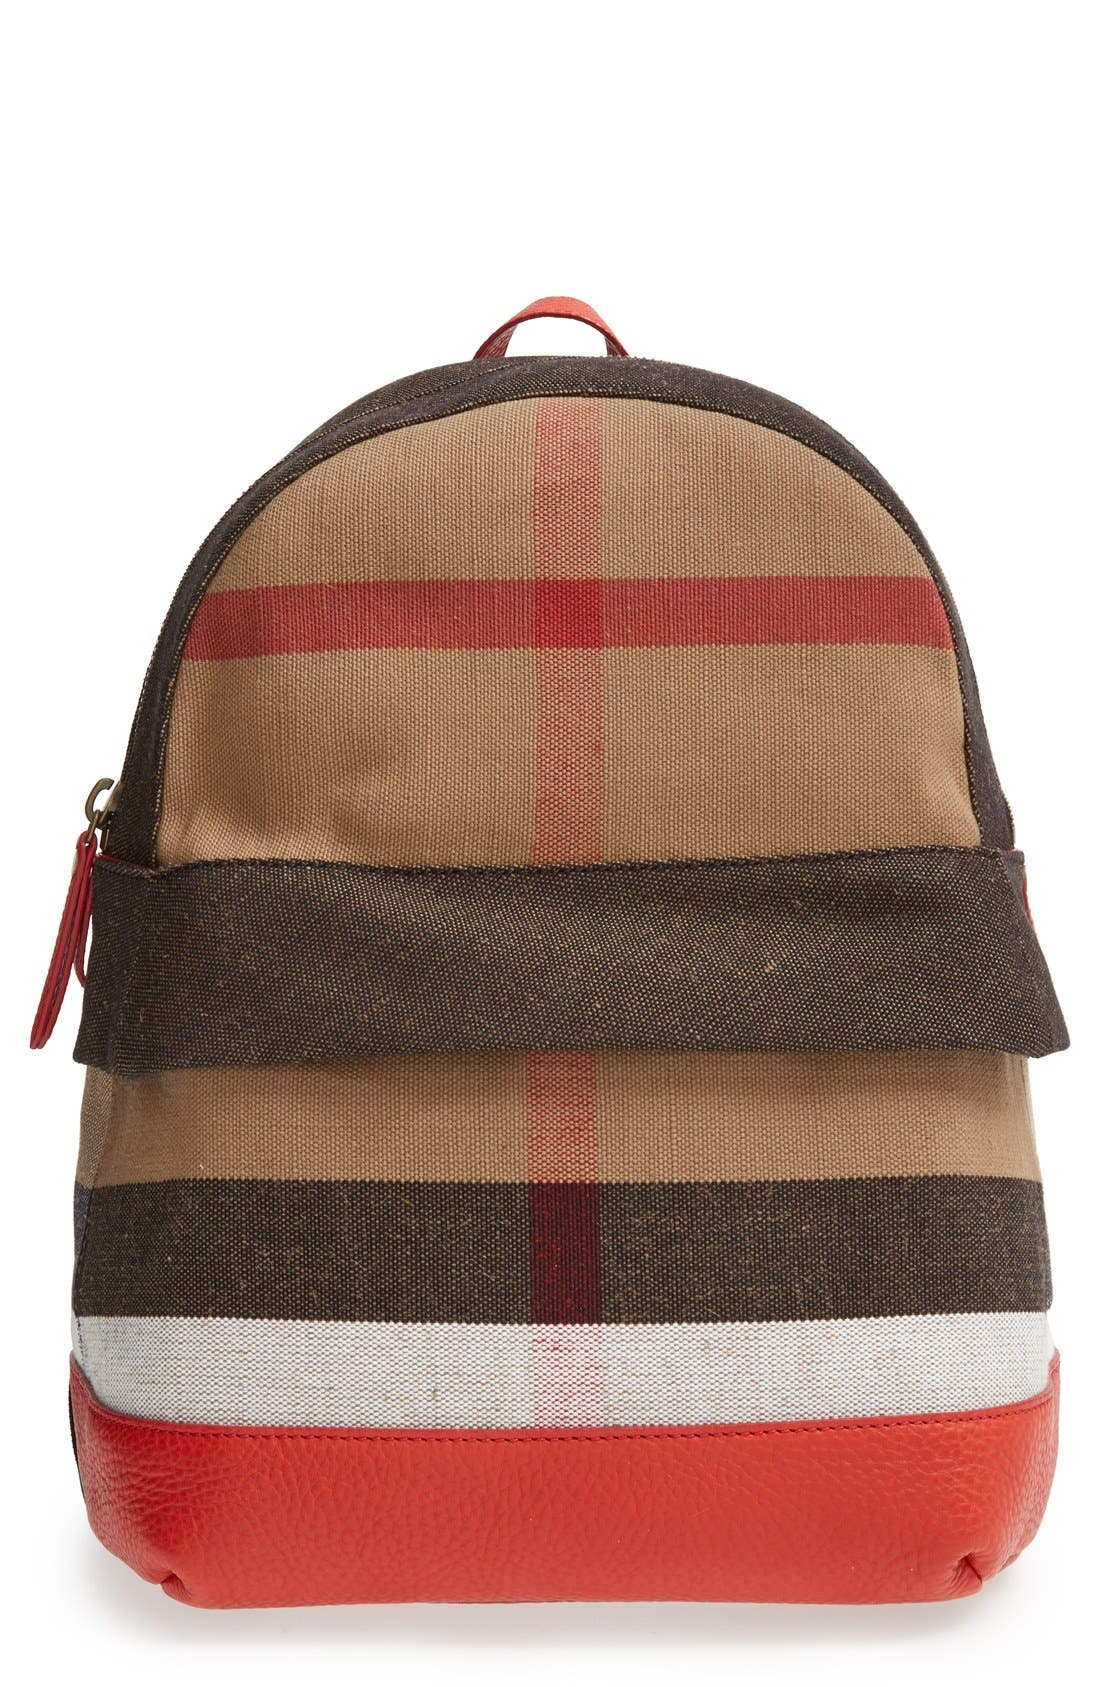 Alternate Image 1 Selected - Burberry 'Tiller Check' Backpack